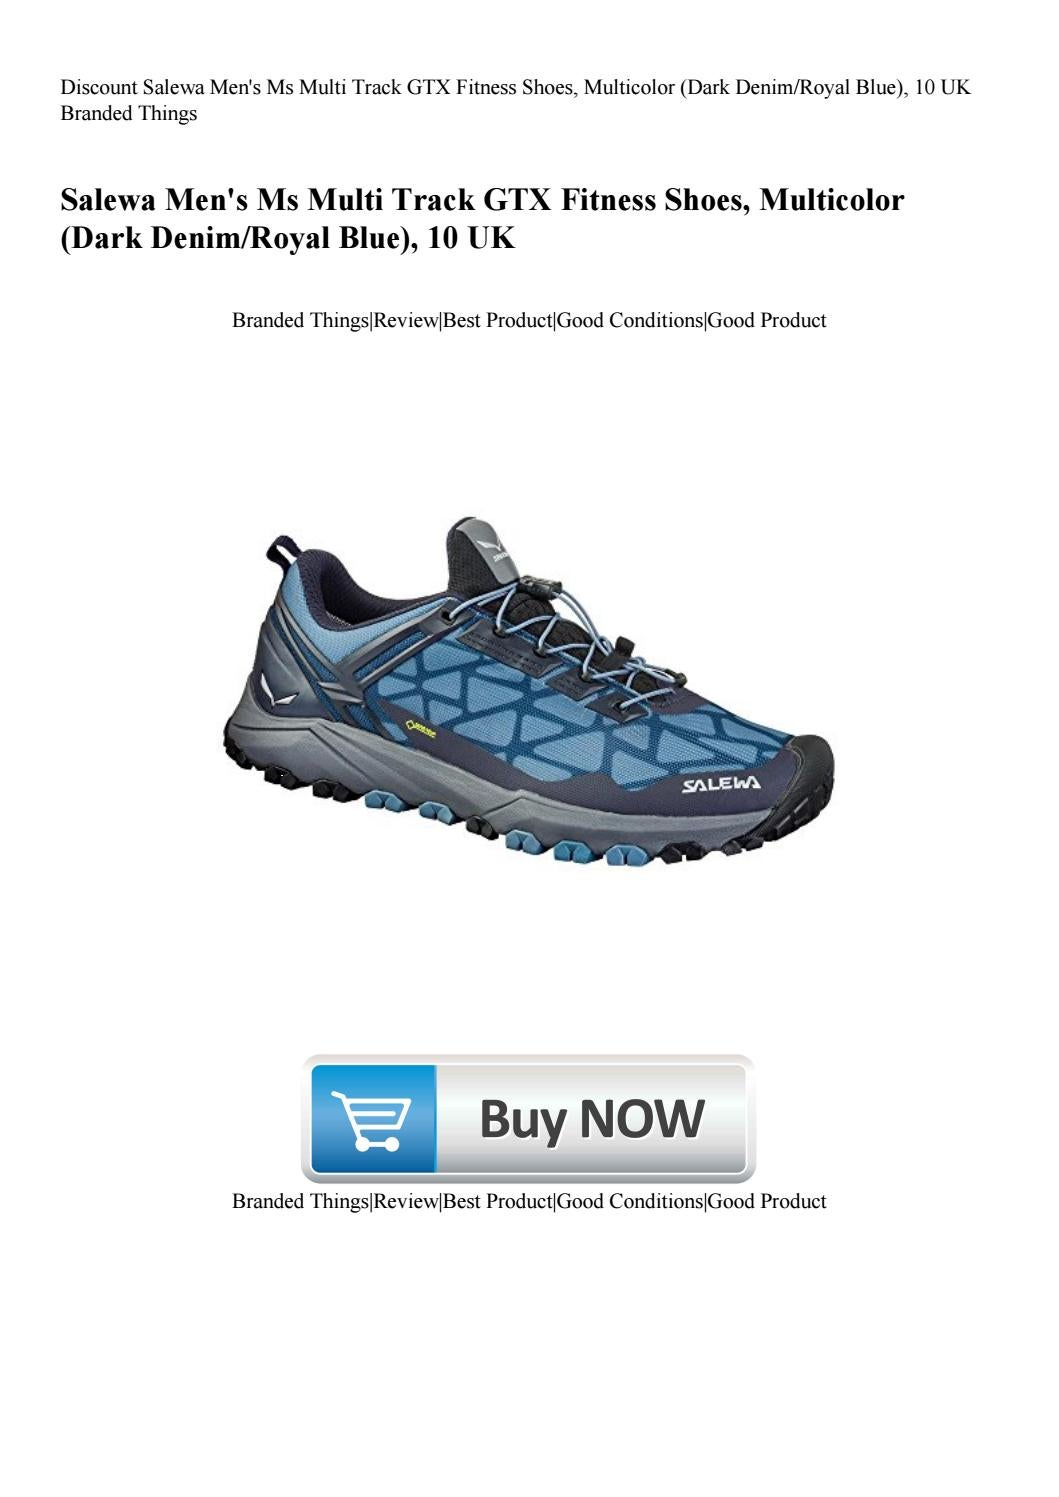 Discount Salewa Men's Ms Multi Track GTX Fitness Shoes